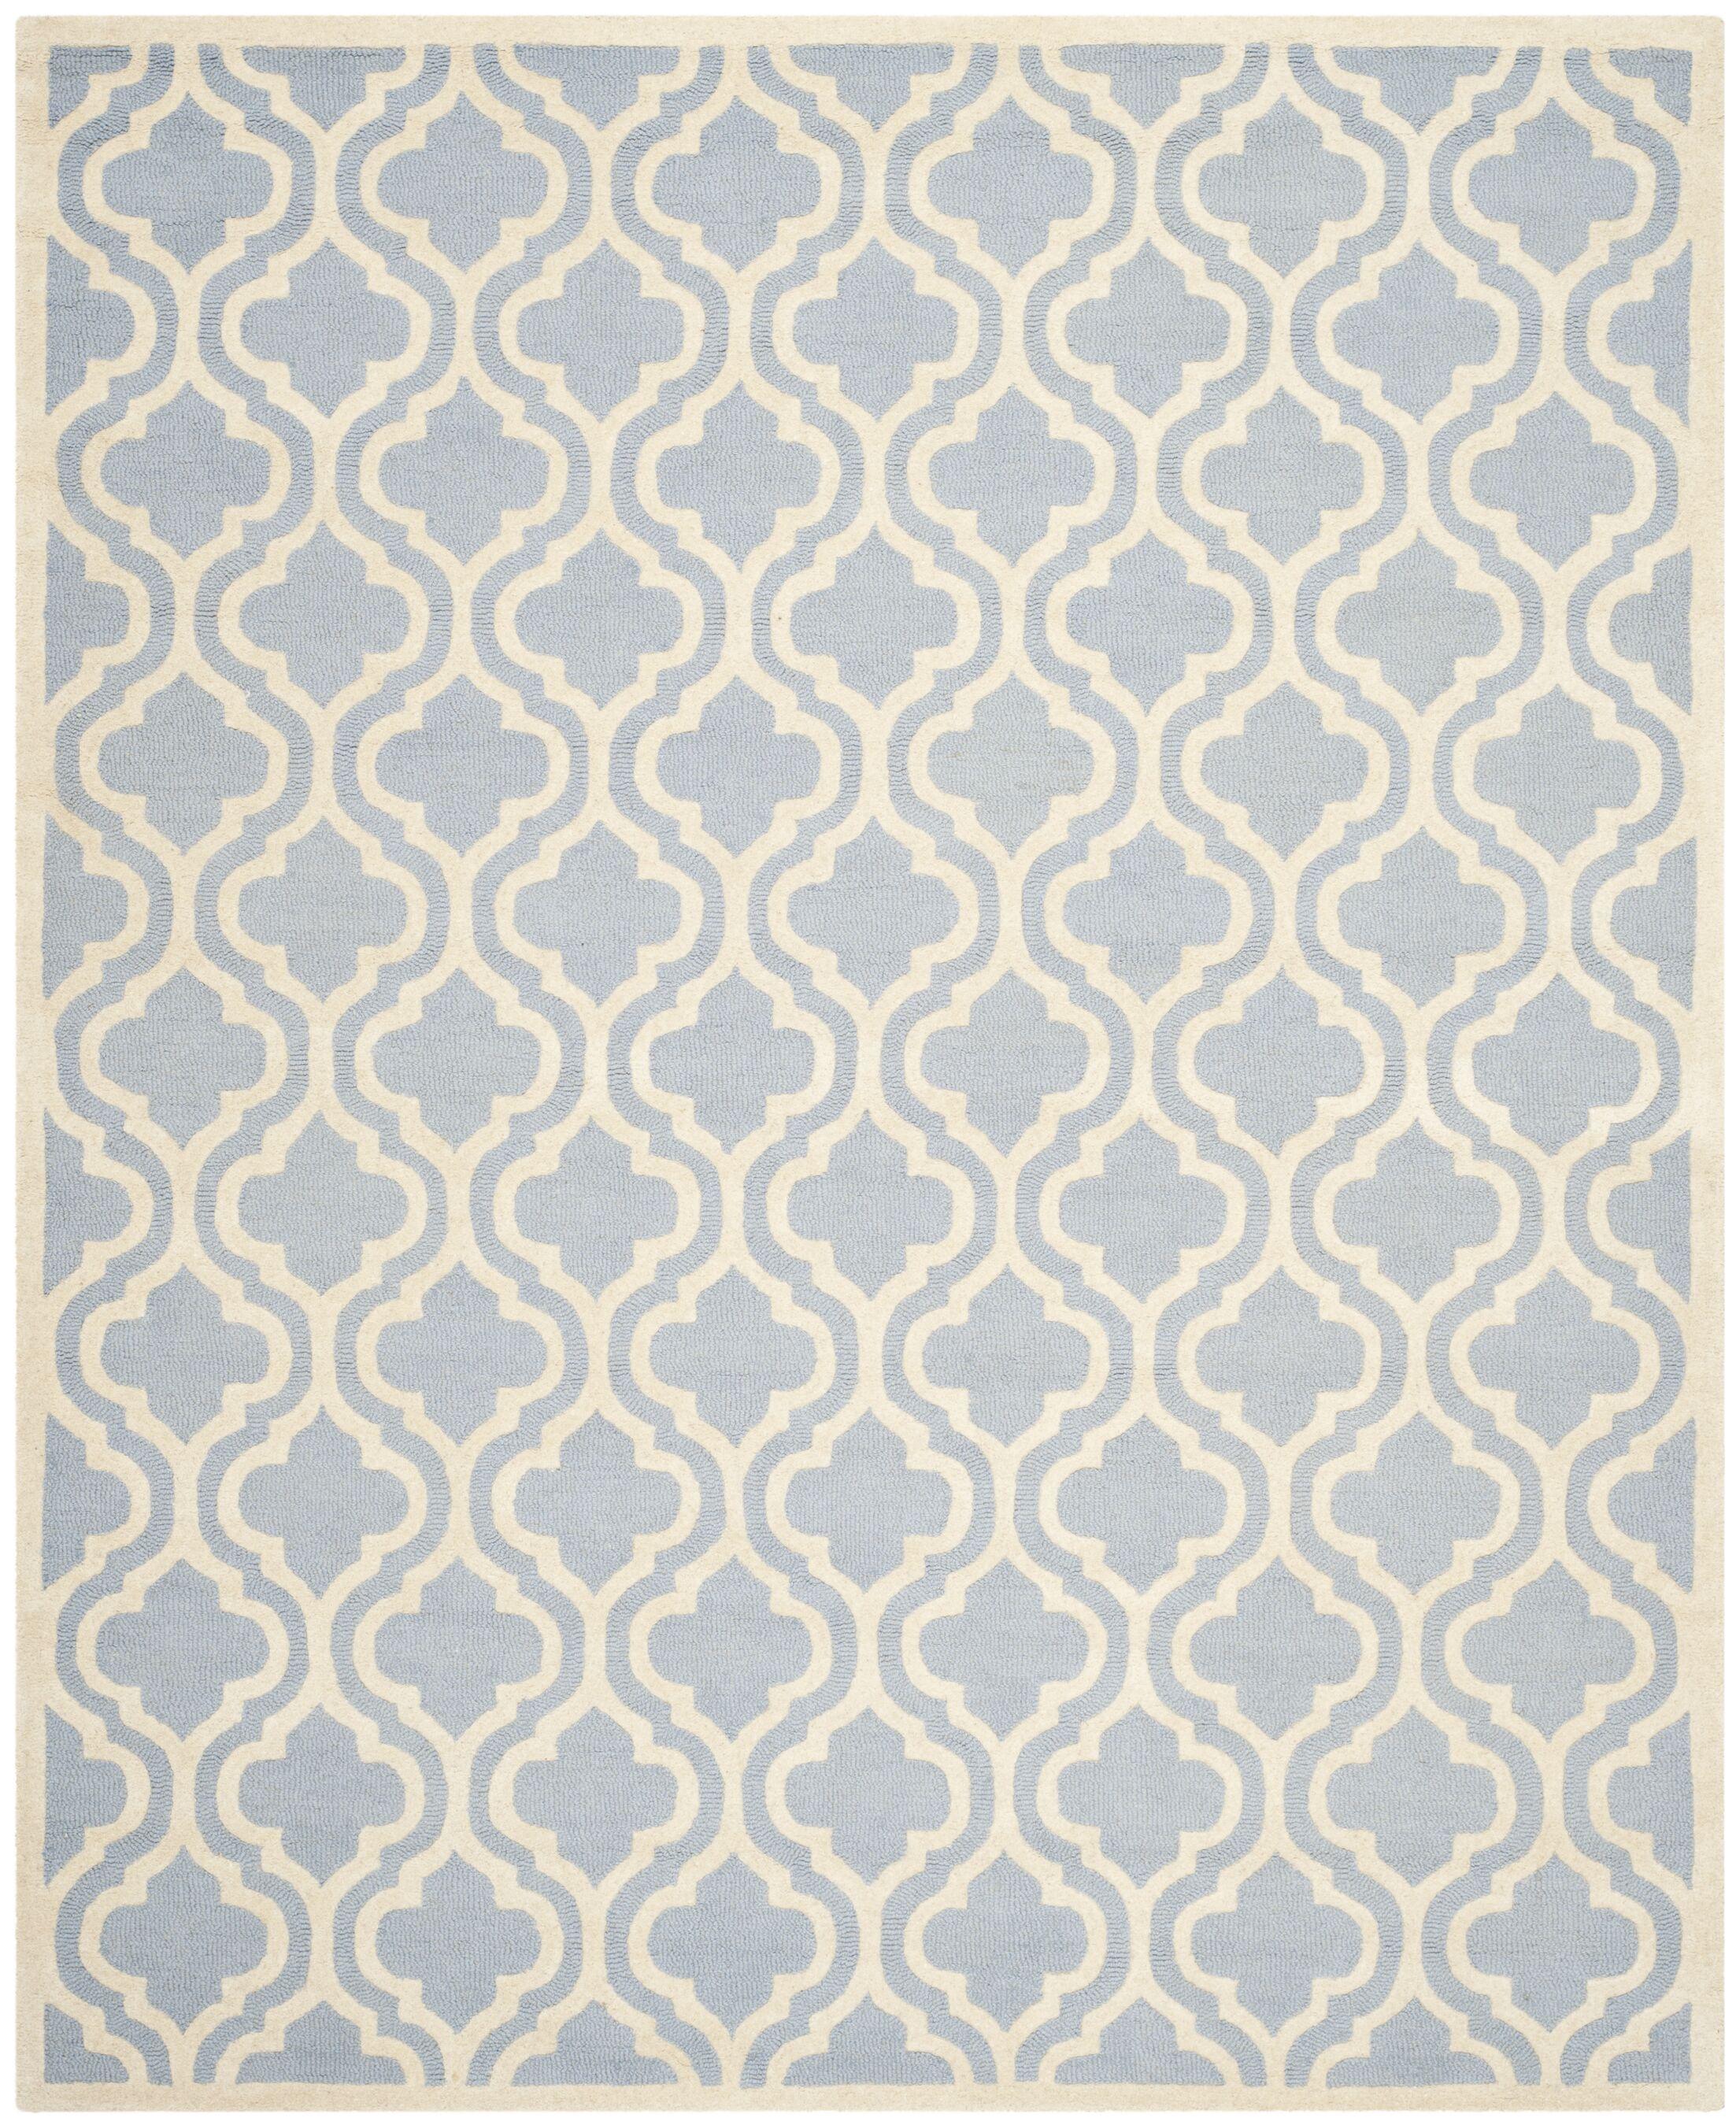 Martins Hand-Tufted Blue/Ivory Area Rug Rug Size: Rectangle 11'6